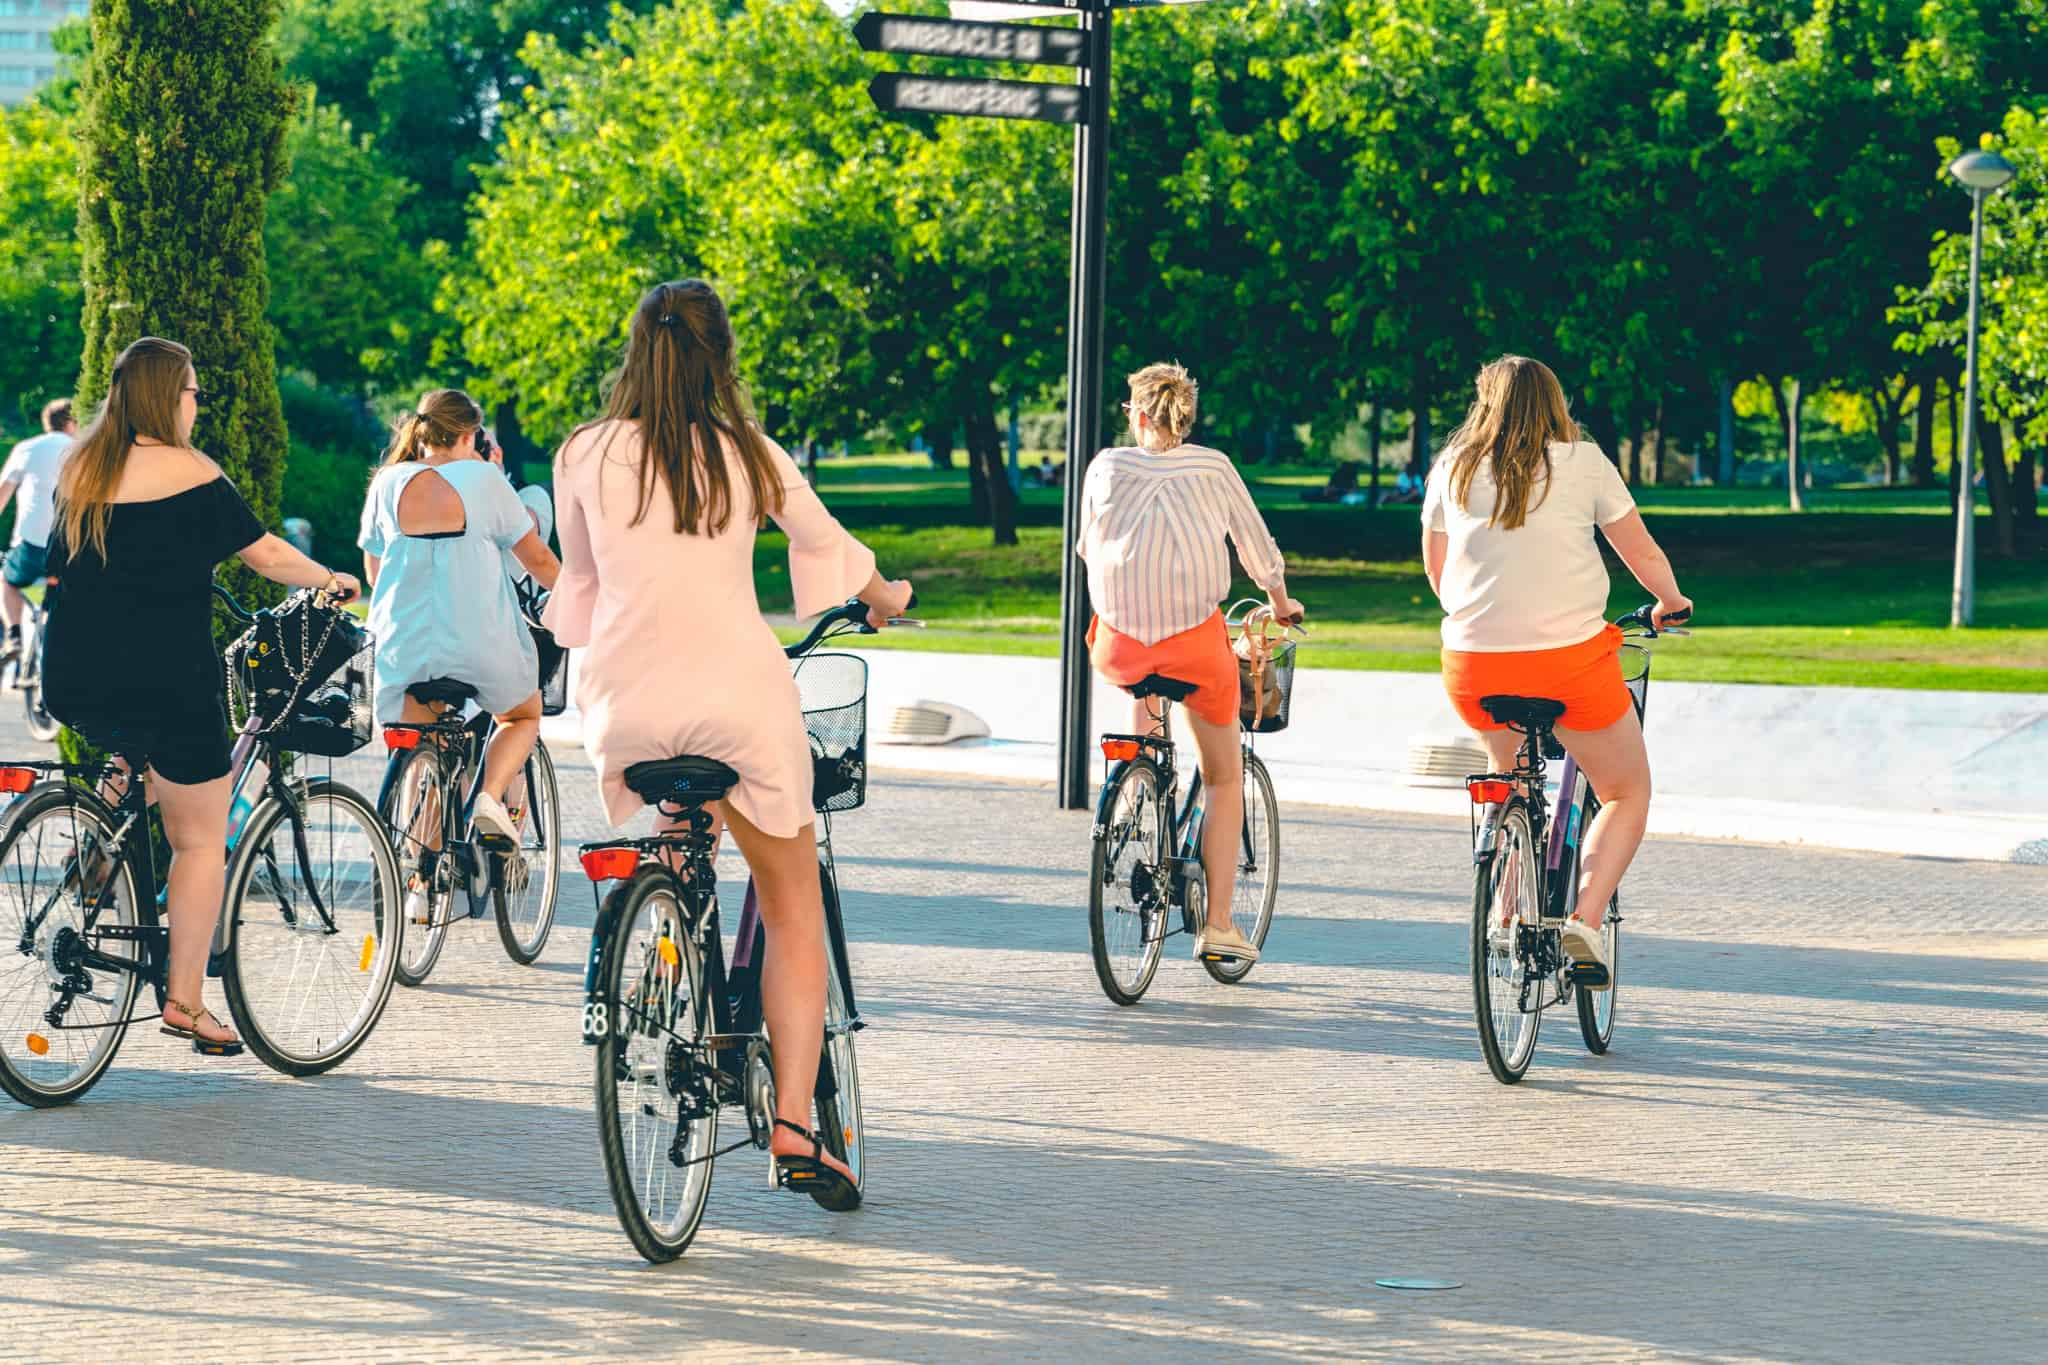 grupo de raparigas a andar de bicicleta